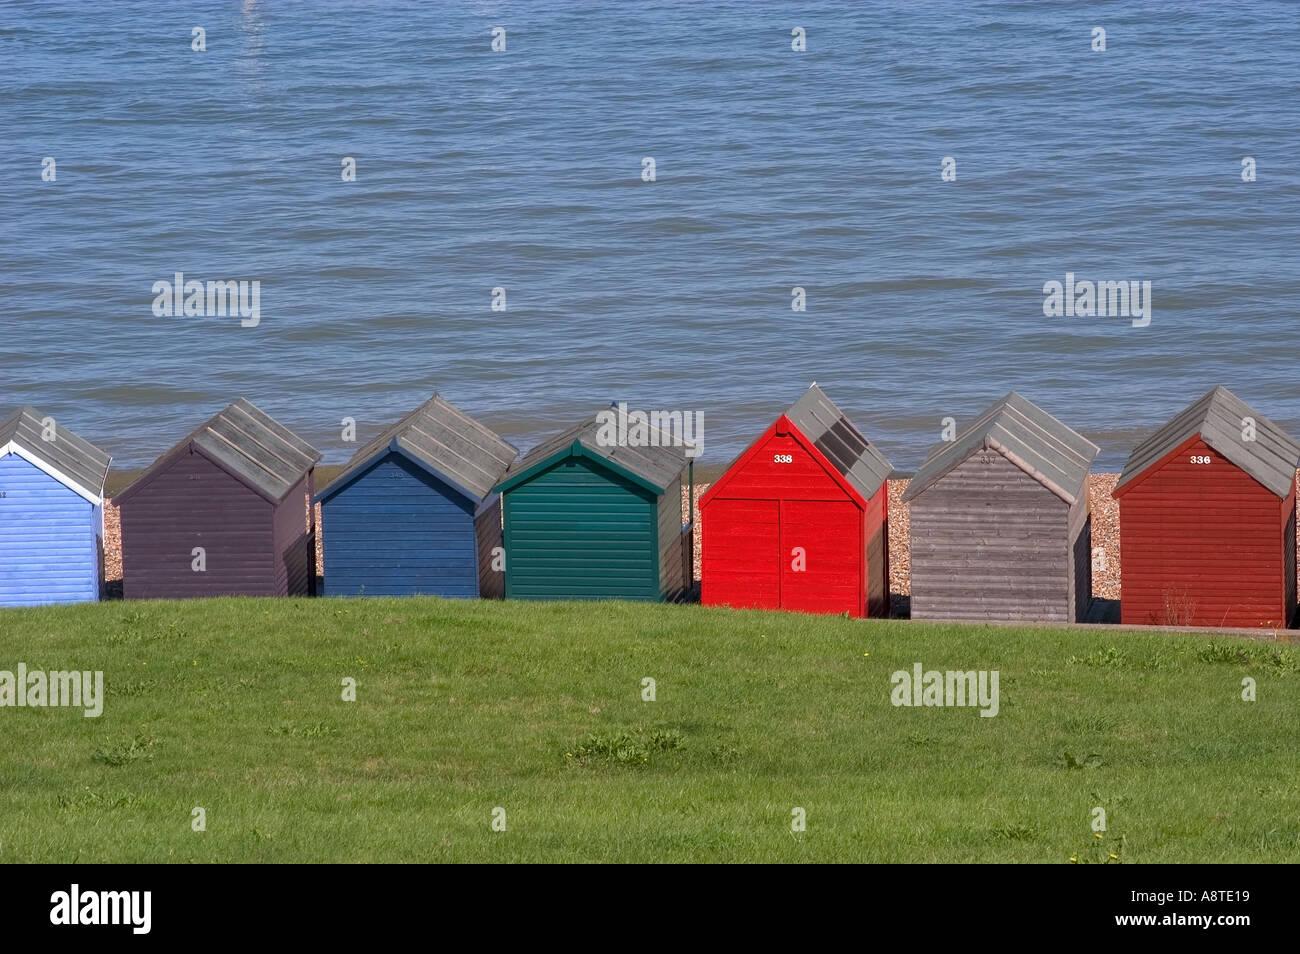 Beach huts at hampton pier herne bay kent stock photo for Model beach huts